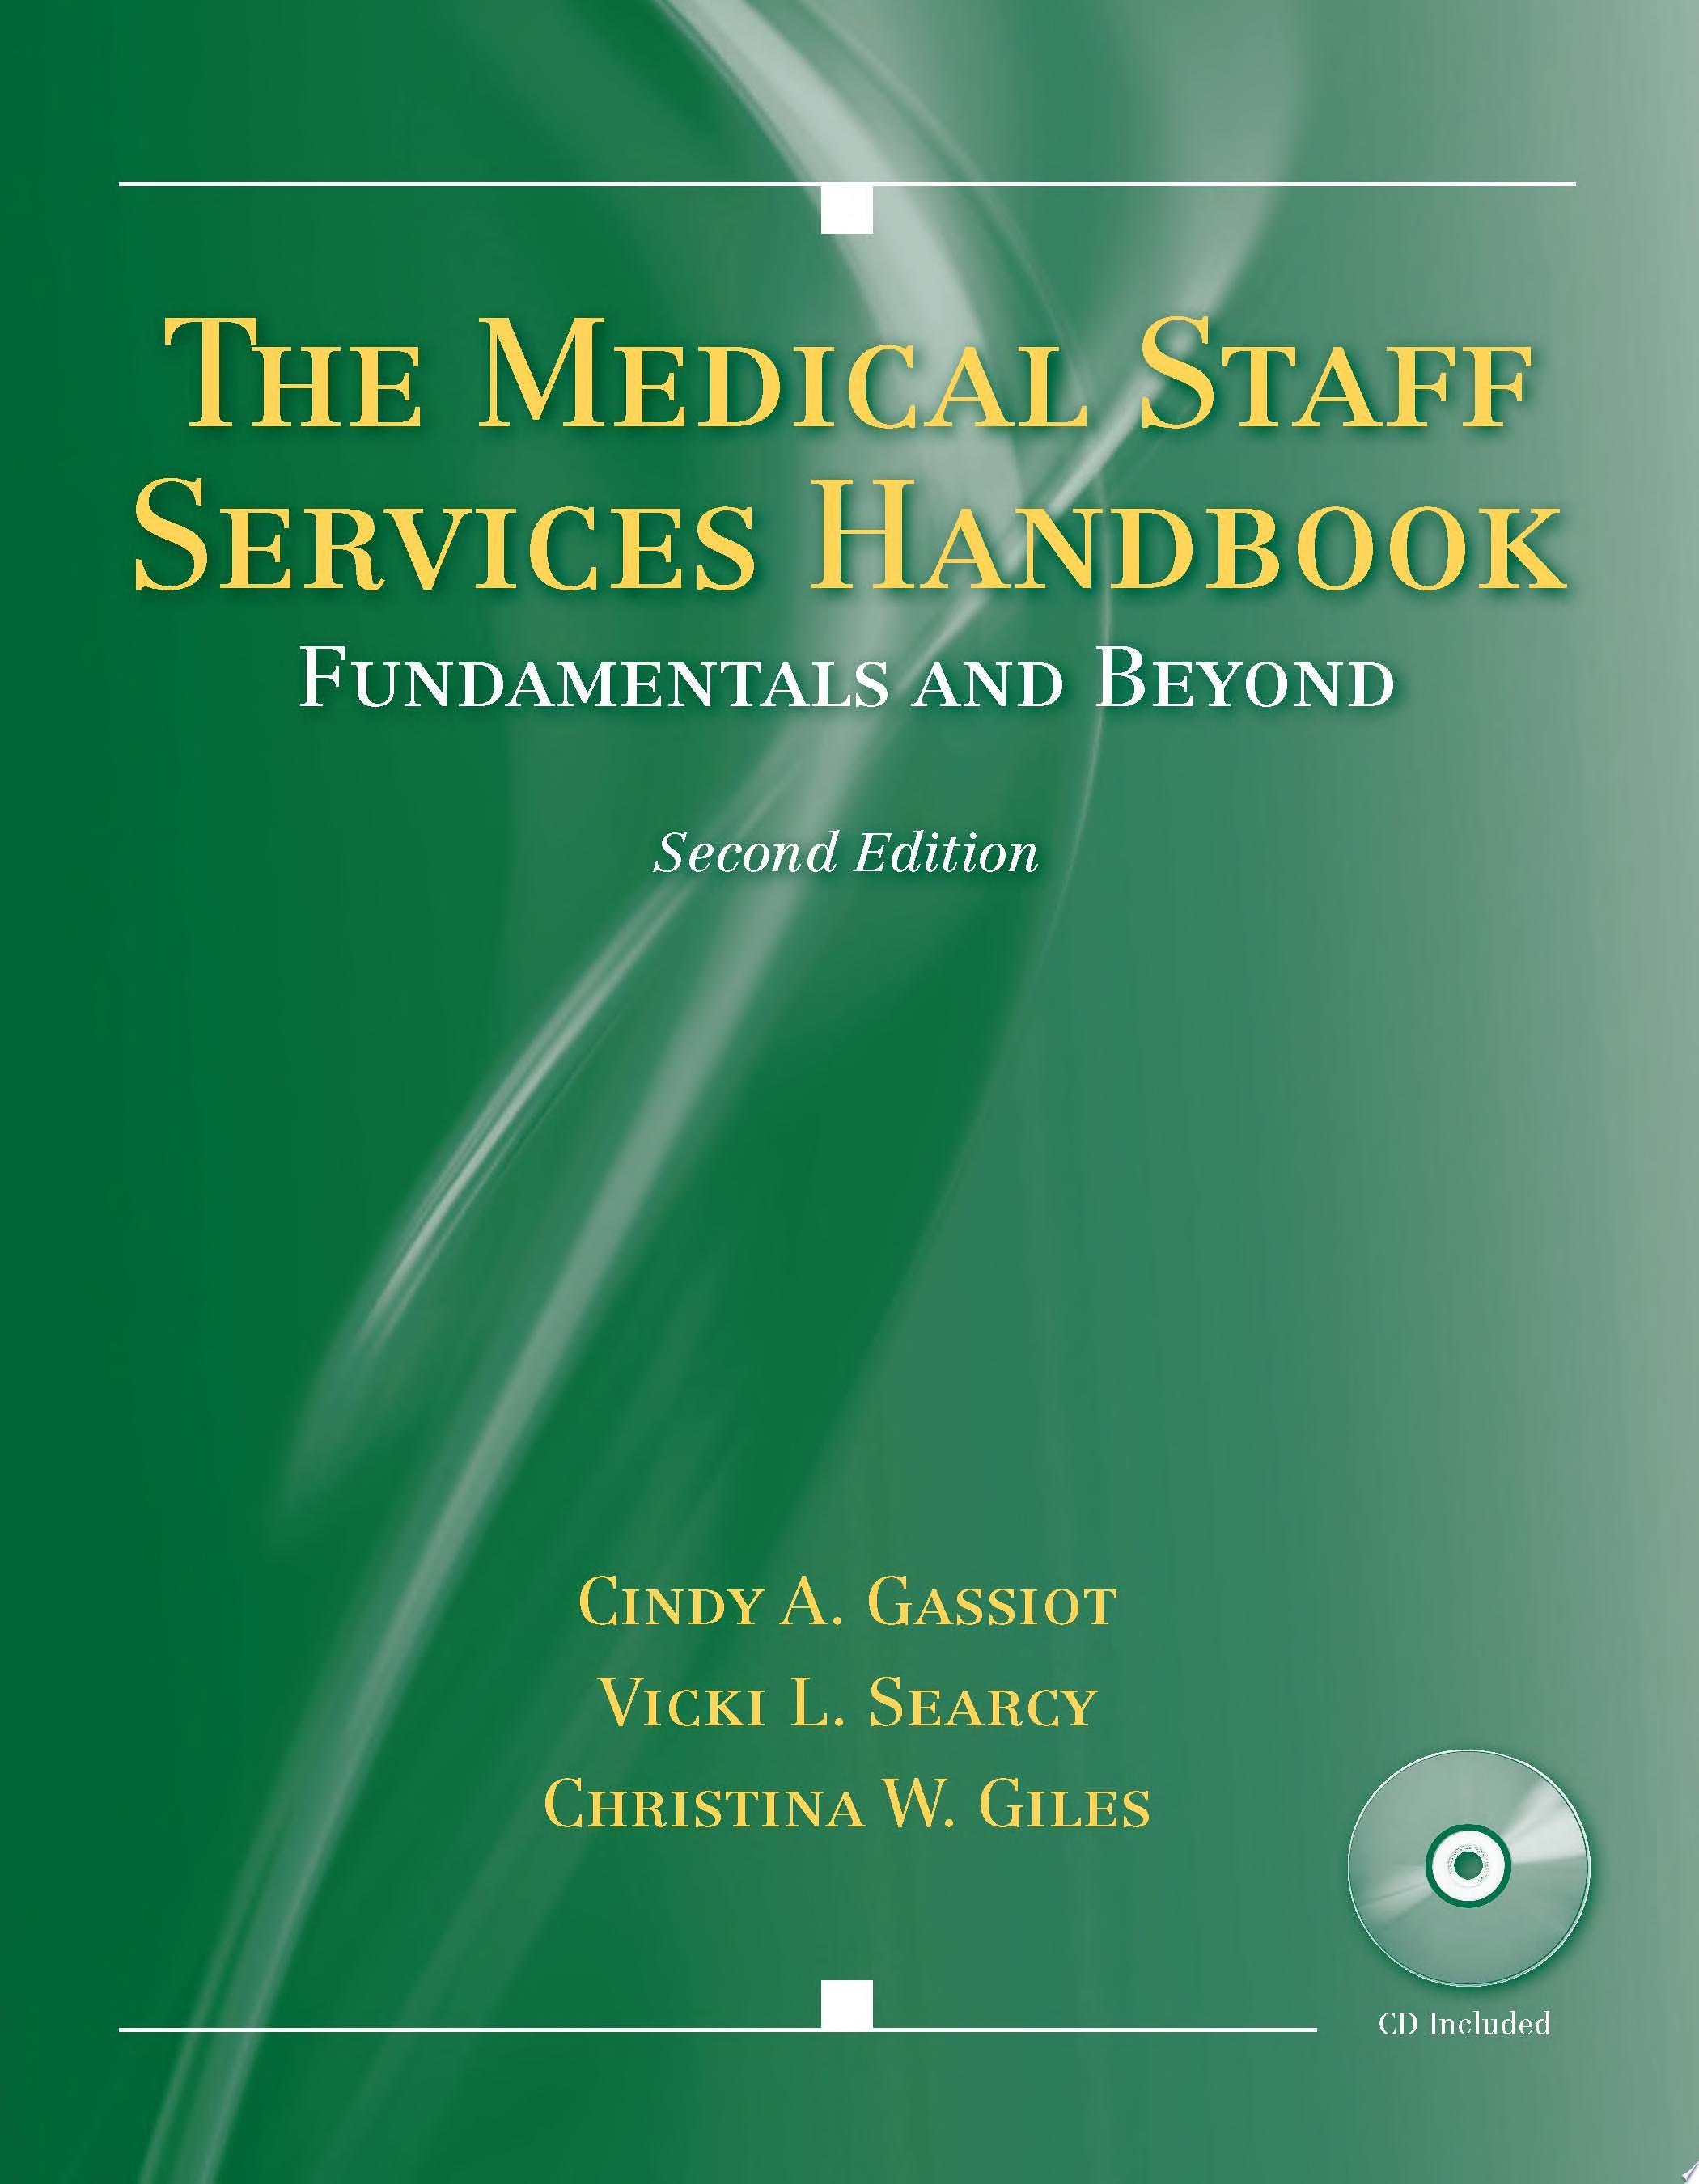 The Medical Staff Services Handbook